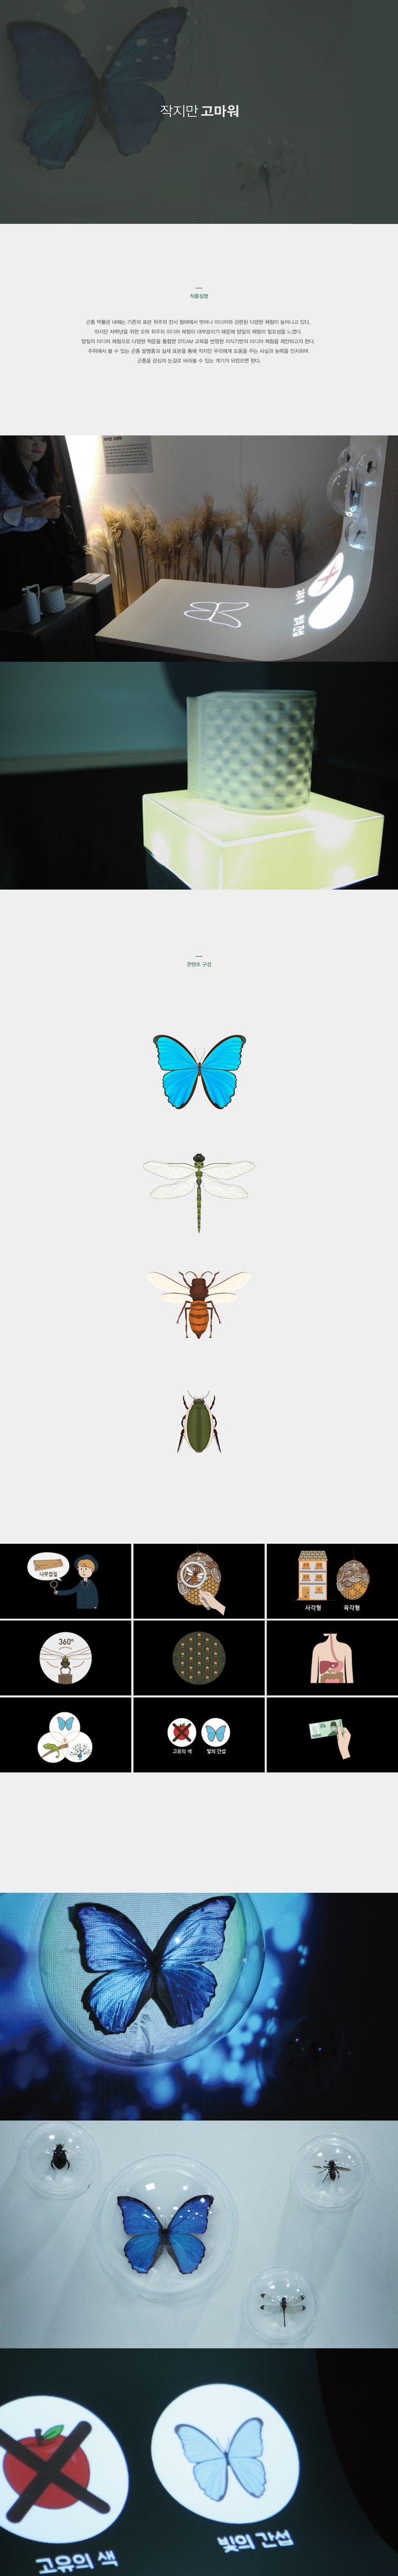 Yoo, Sun Joo, Kim, You Jung, Park, Jae Jin | Thanks, little bugs! | Digital Media Design project Class 2017 | Major in Digital Media Design │#hicoda│hicoda.hongik.ac.kr https://www.pinterest.co.kr/pin/558446422537237053/